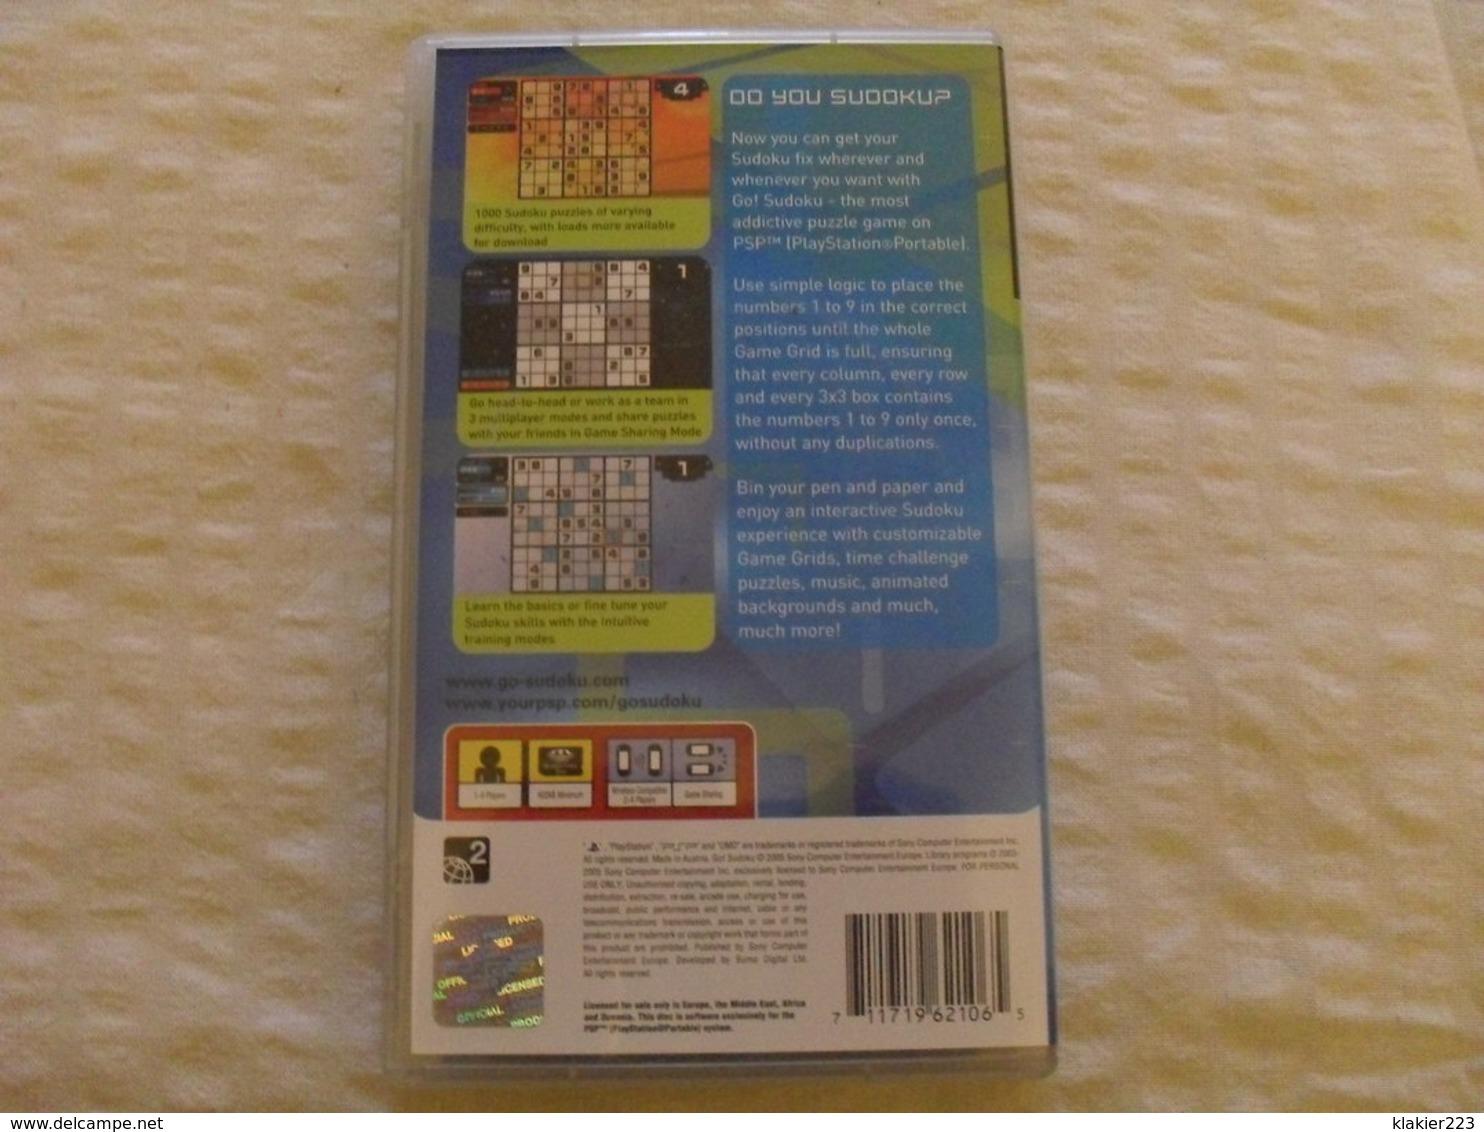 GO! Sudoku / SONY PSP - Sony PlayStation